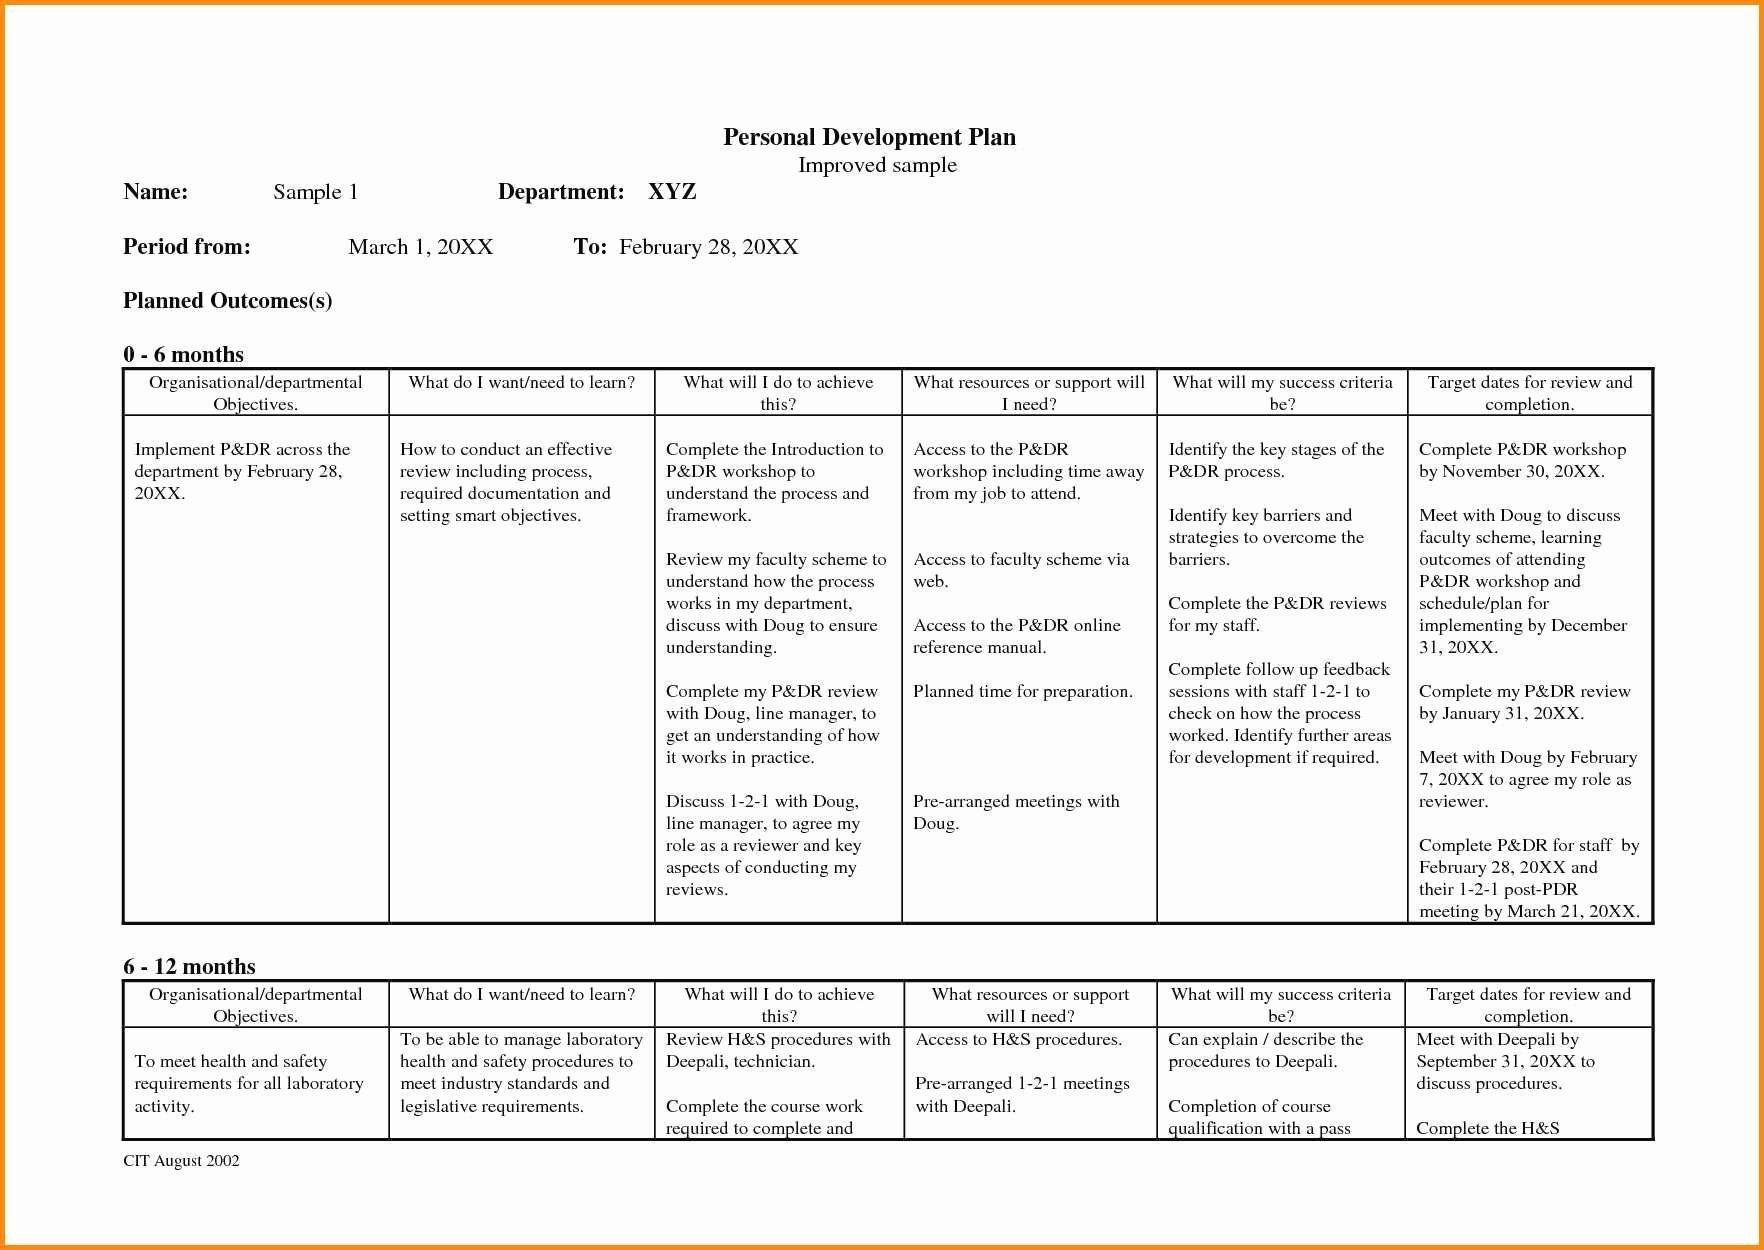 Strategic Plan Template for Nonprofits Beautiful Fresh Sample Strategic Plan Nonprofit organization